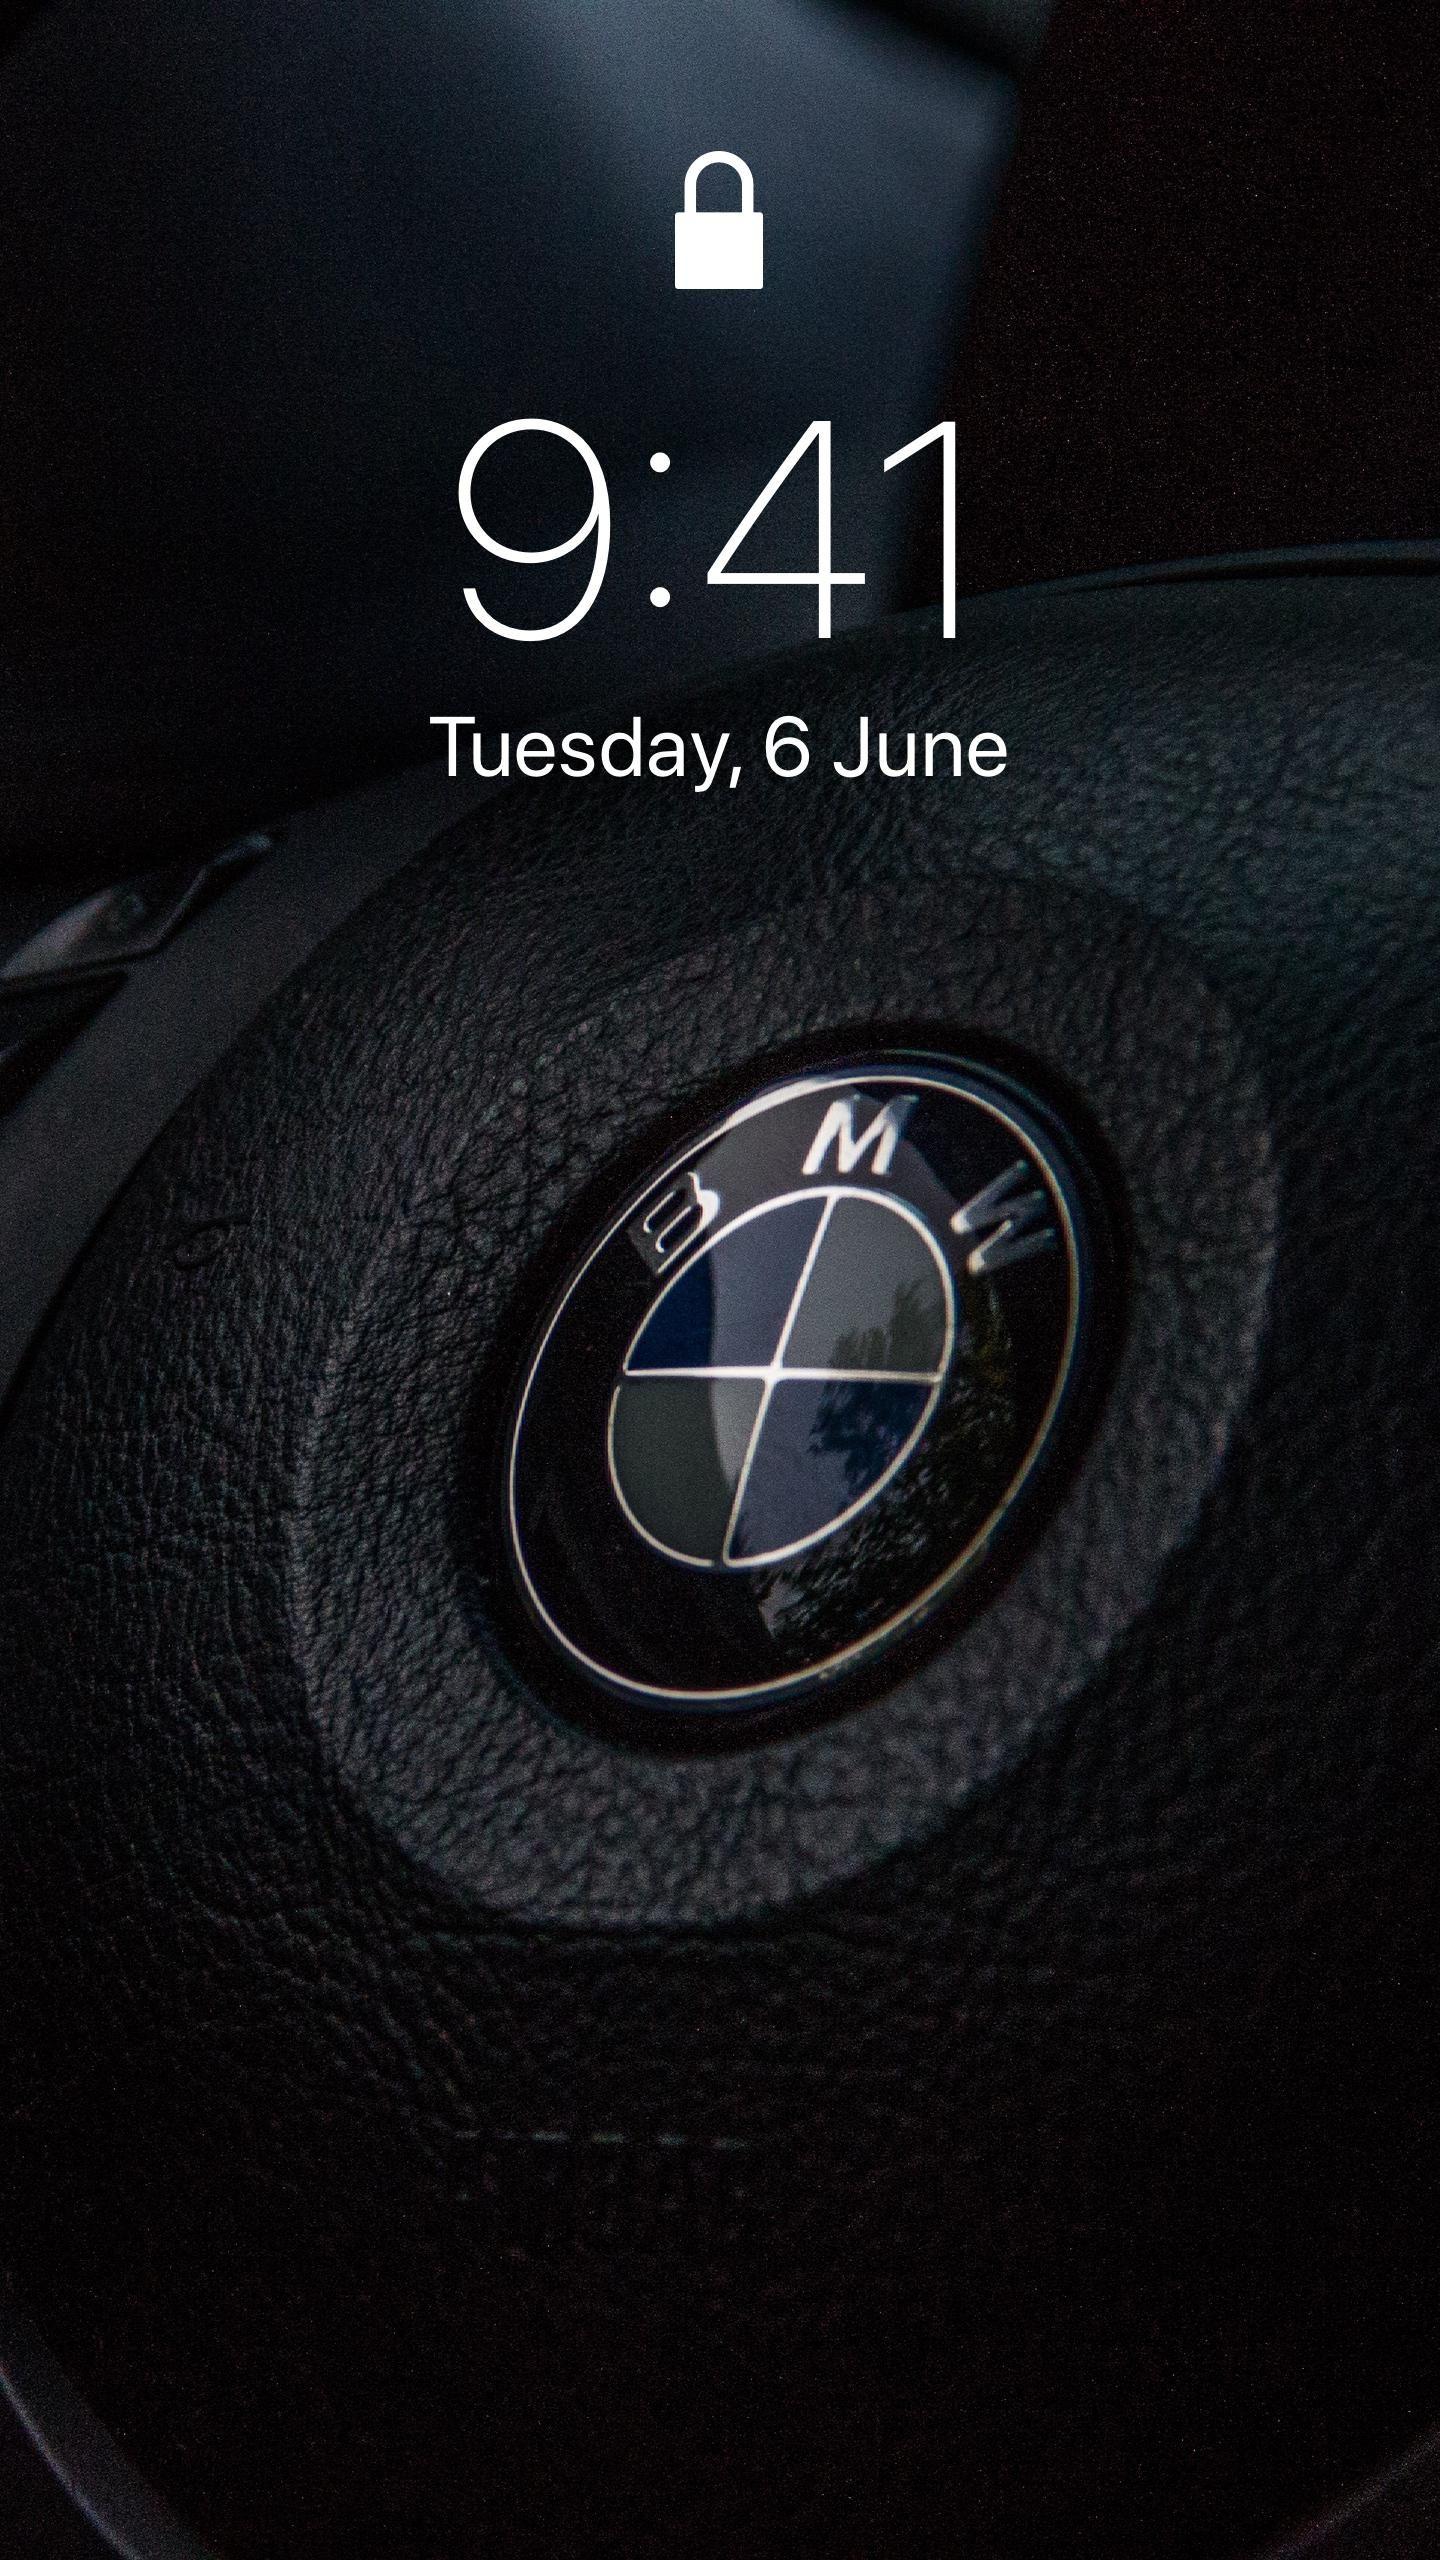 Bmw Wheel Logo Background Wallpaper Hd Iphone Ipad Bmw Background Iphone Background Bmw